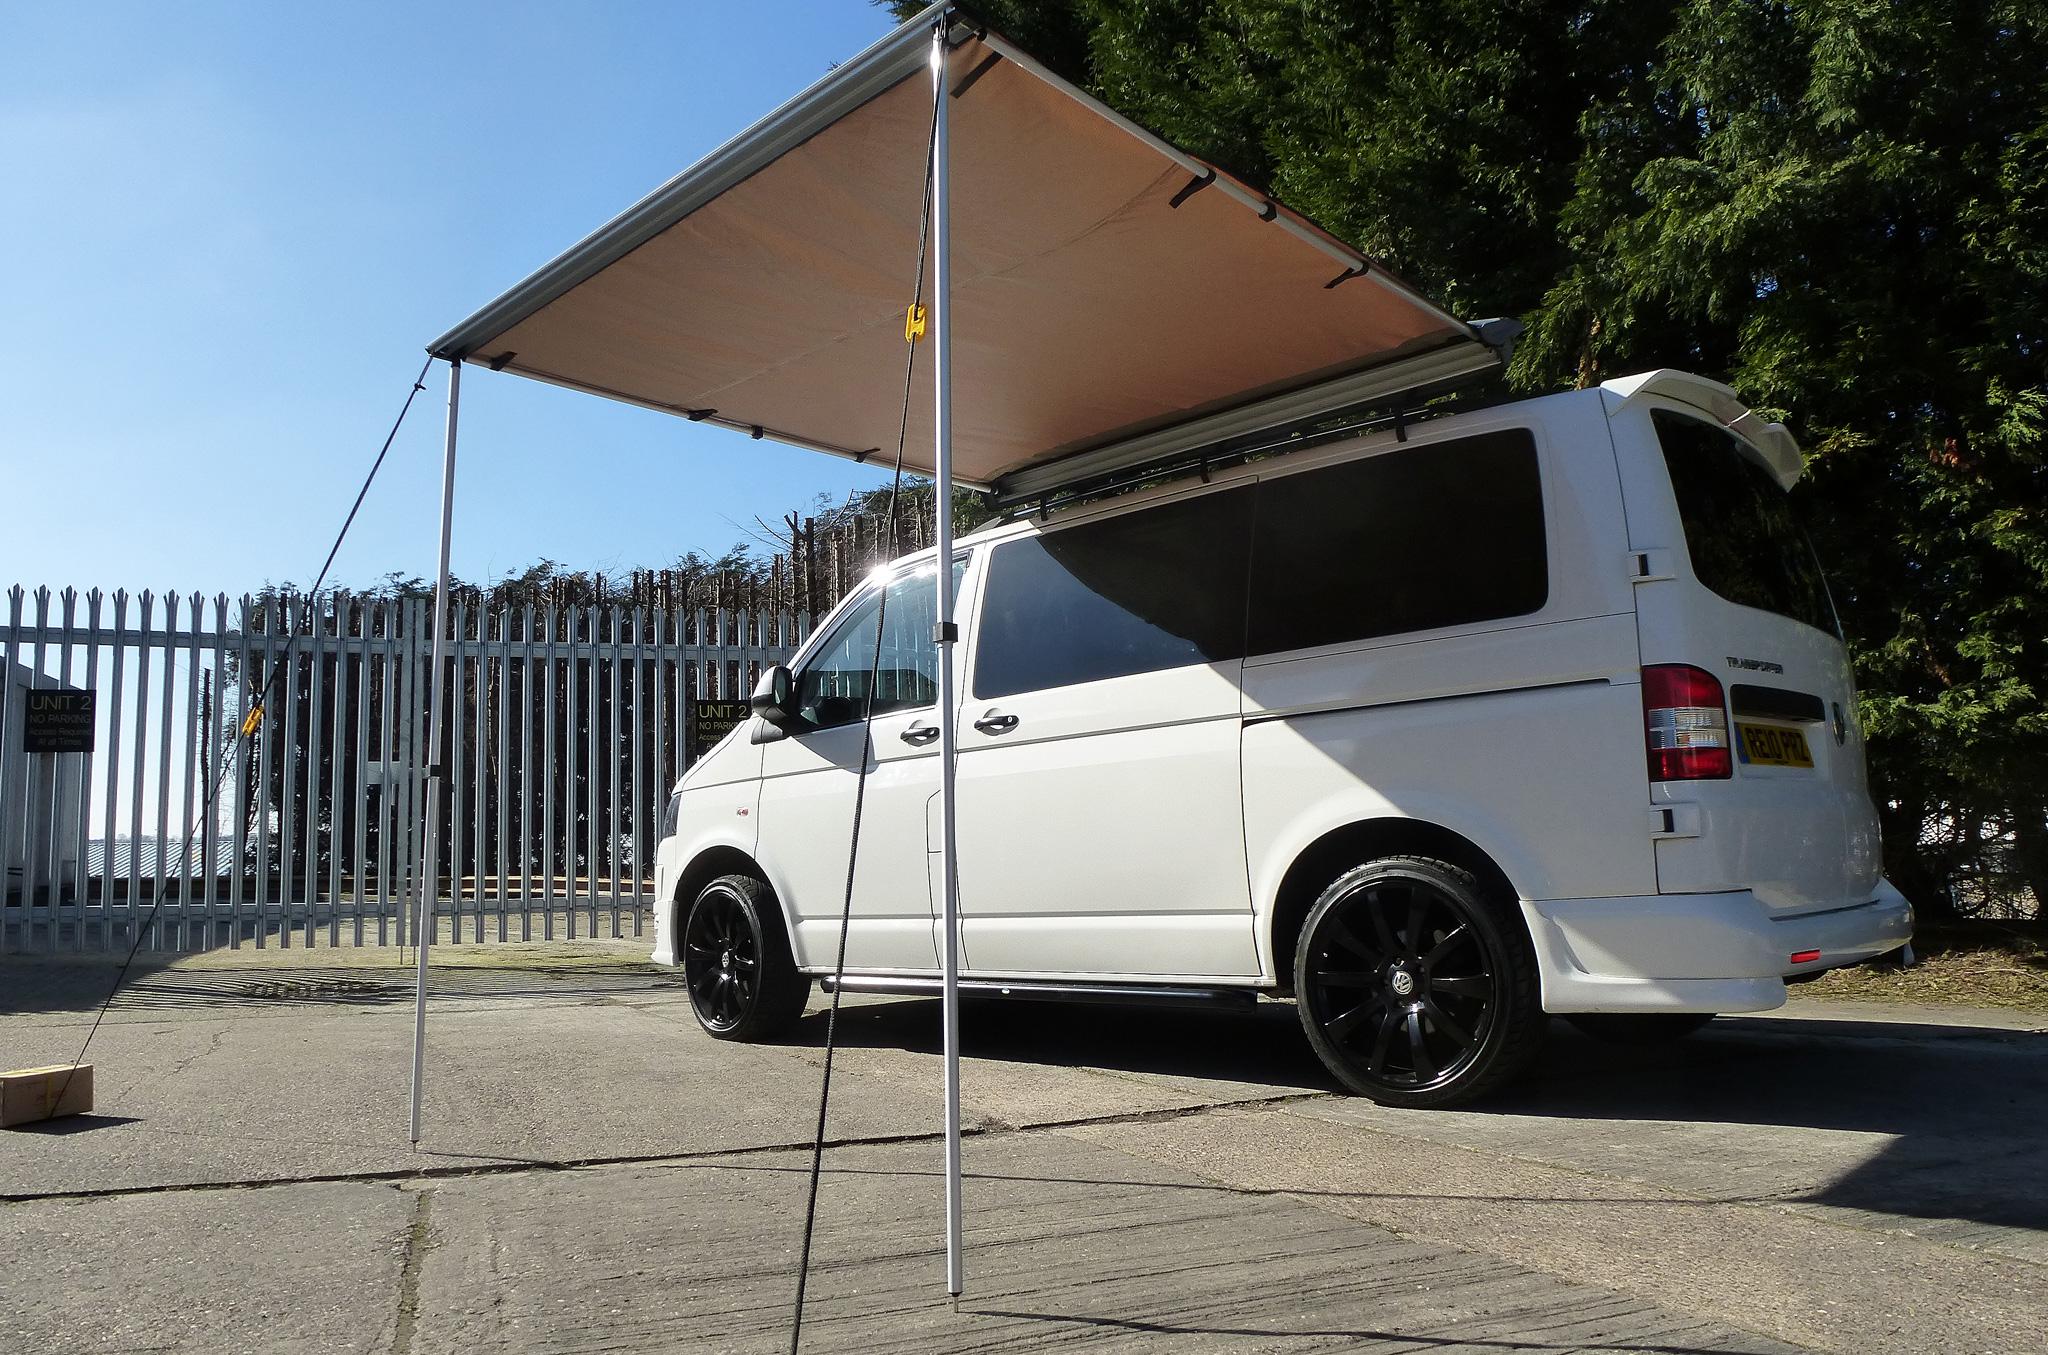 2M X 2M VW C&er Van Tent Awning Heavy Duty Roof Racks Tents Safari Outdoor & 2M X 2M VW Camper Van Tent Awning Heavy Duty Roof Racks Tents ...